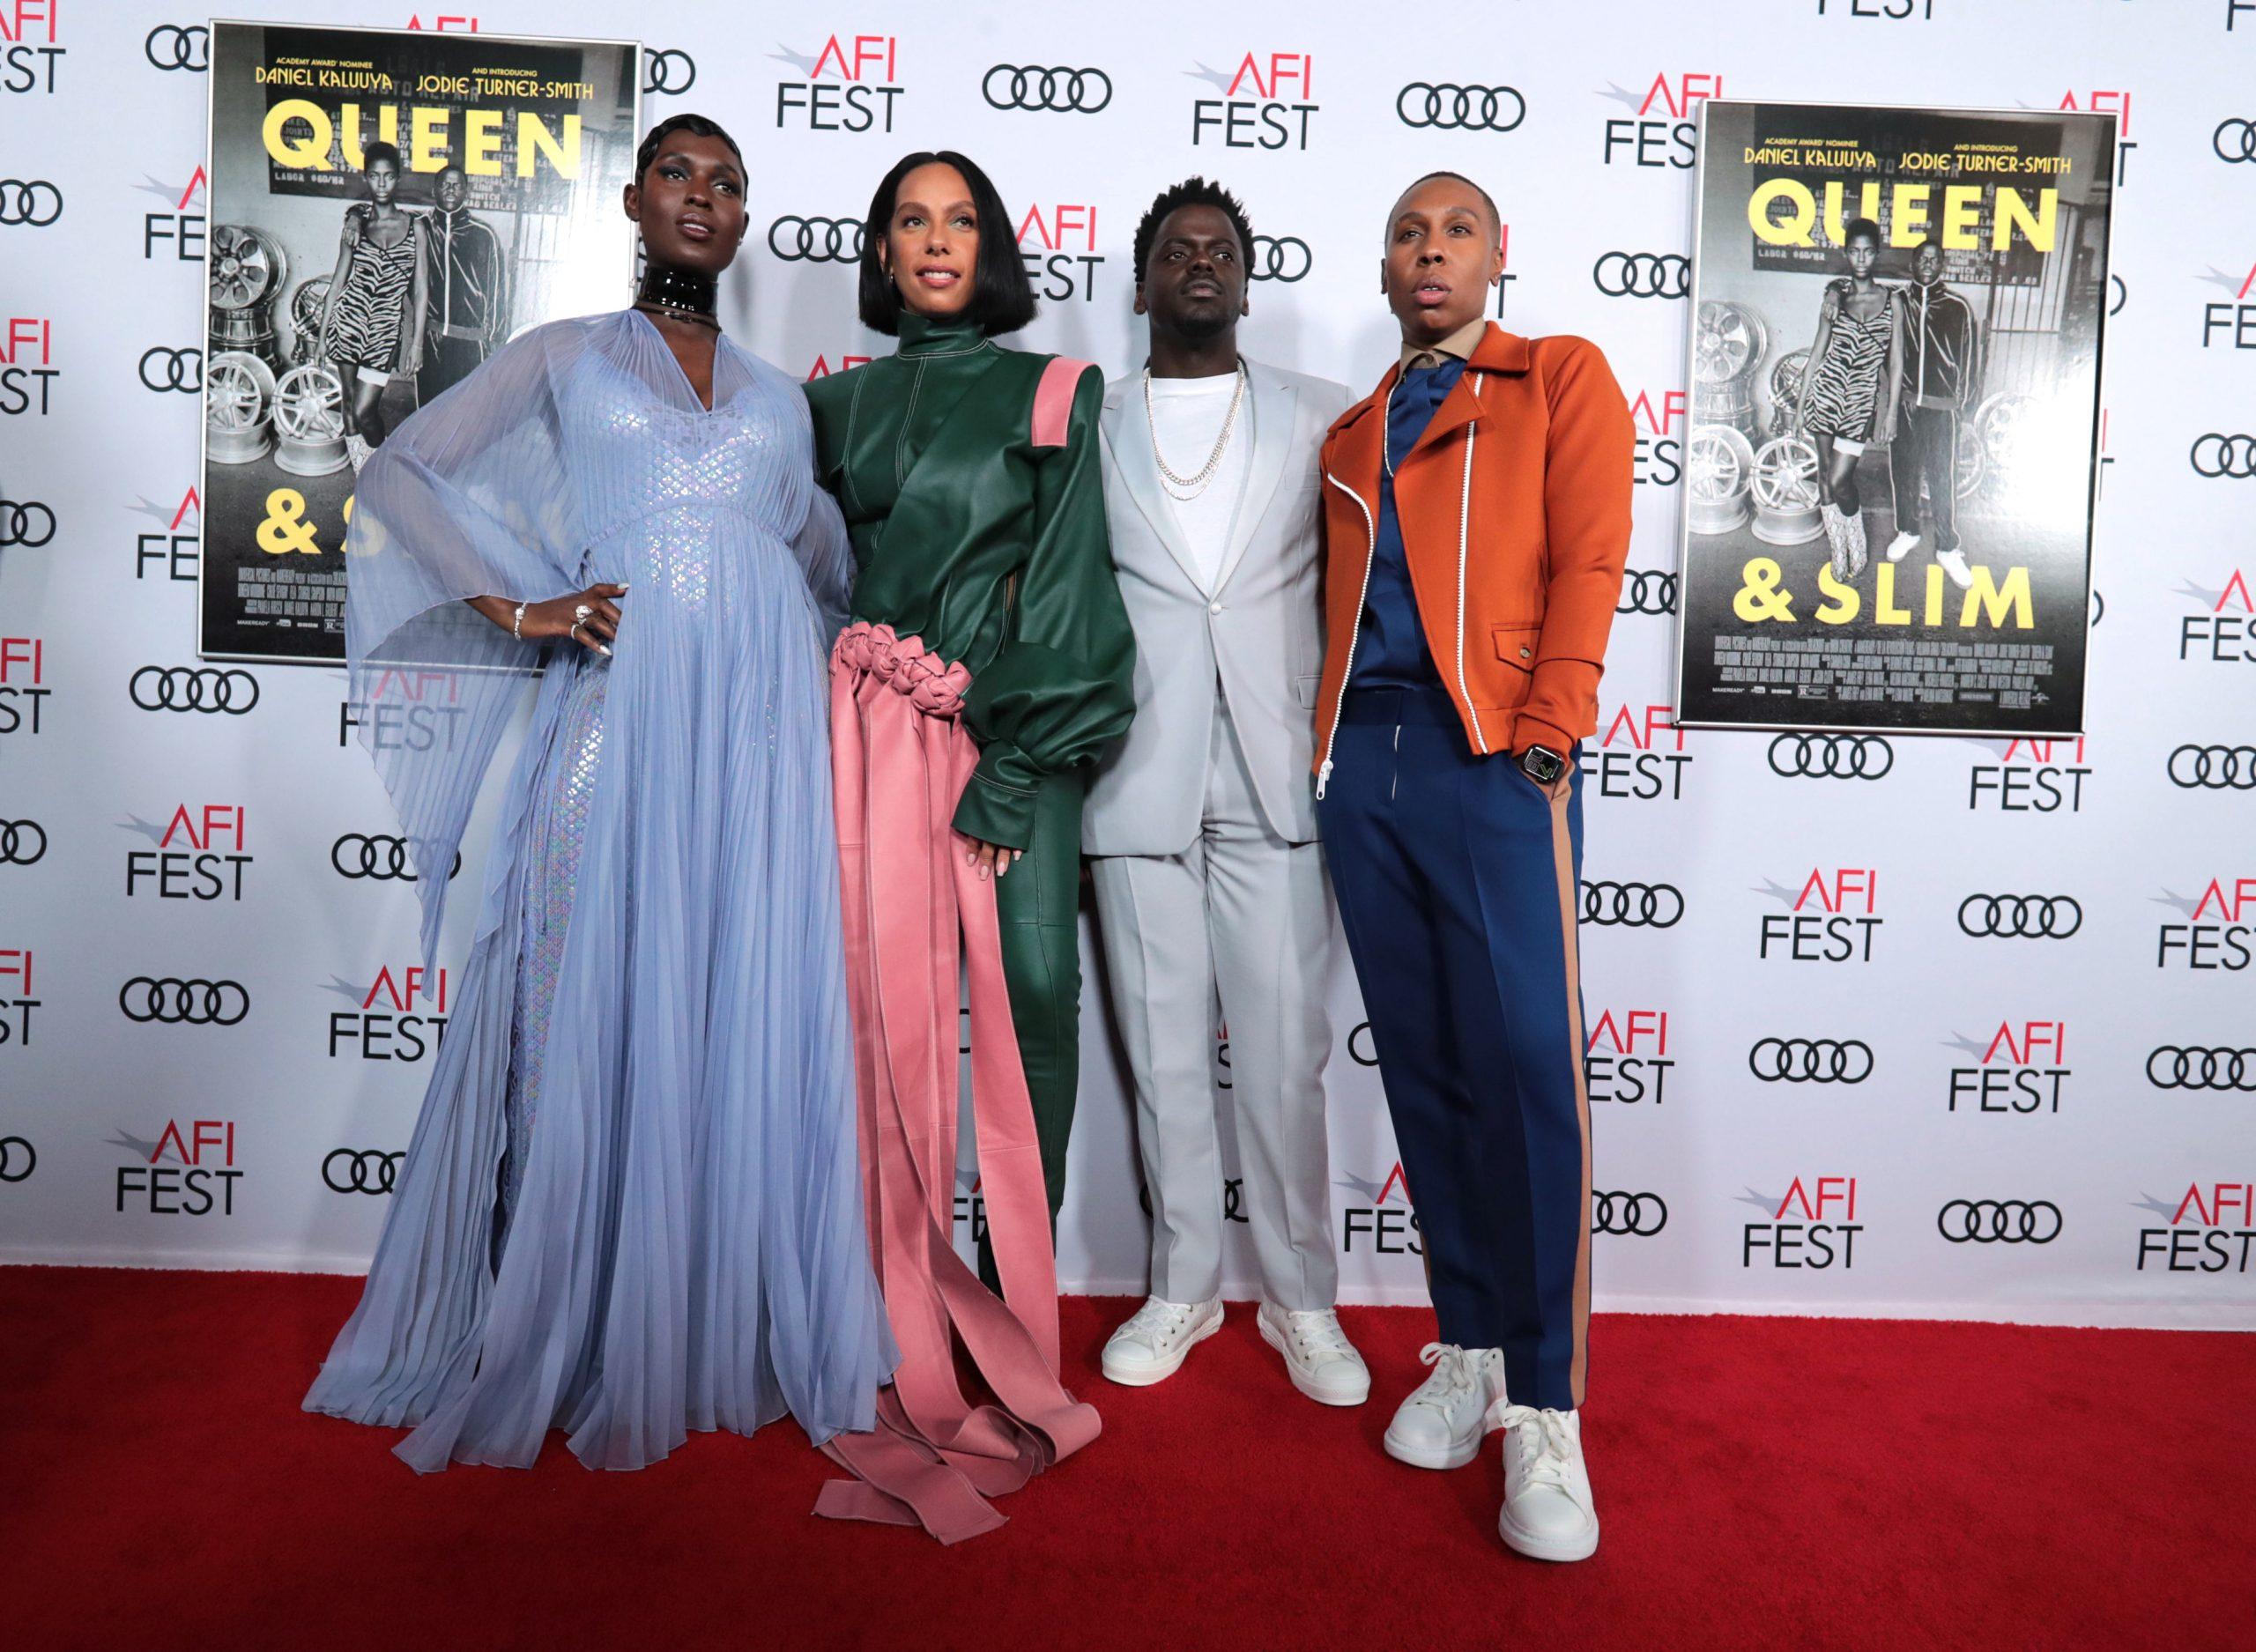 Queen & Slim World Premiere In Los Angeles